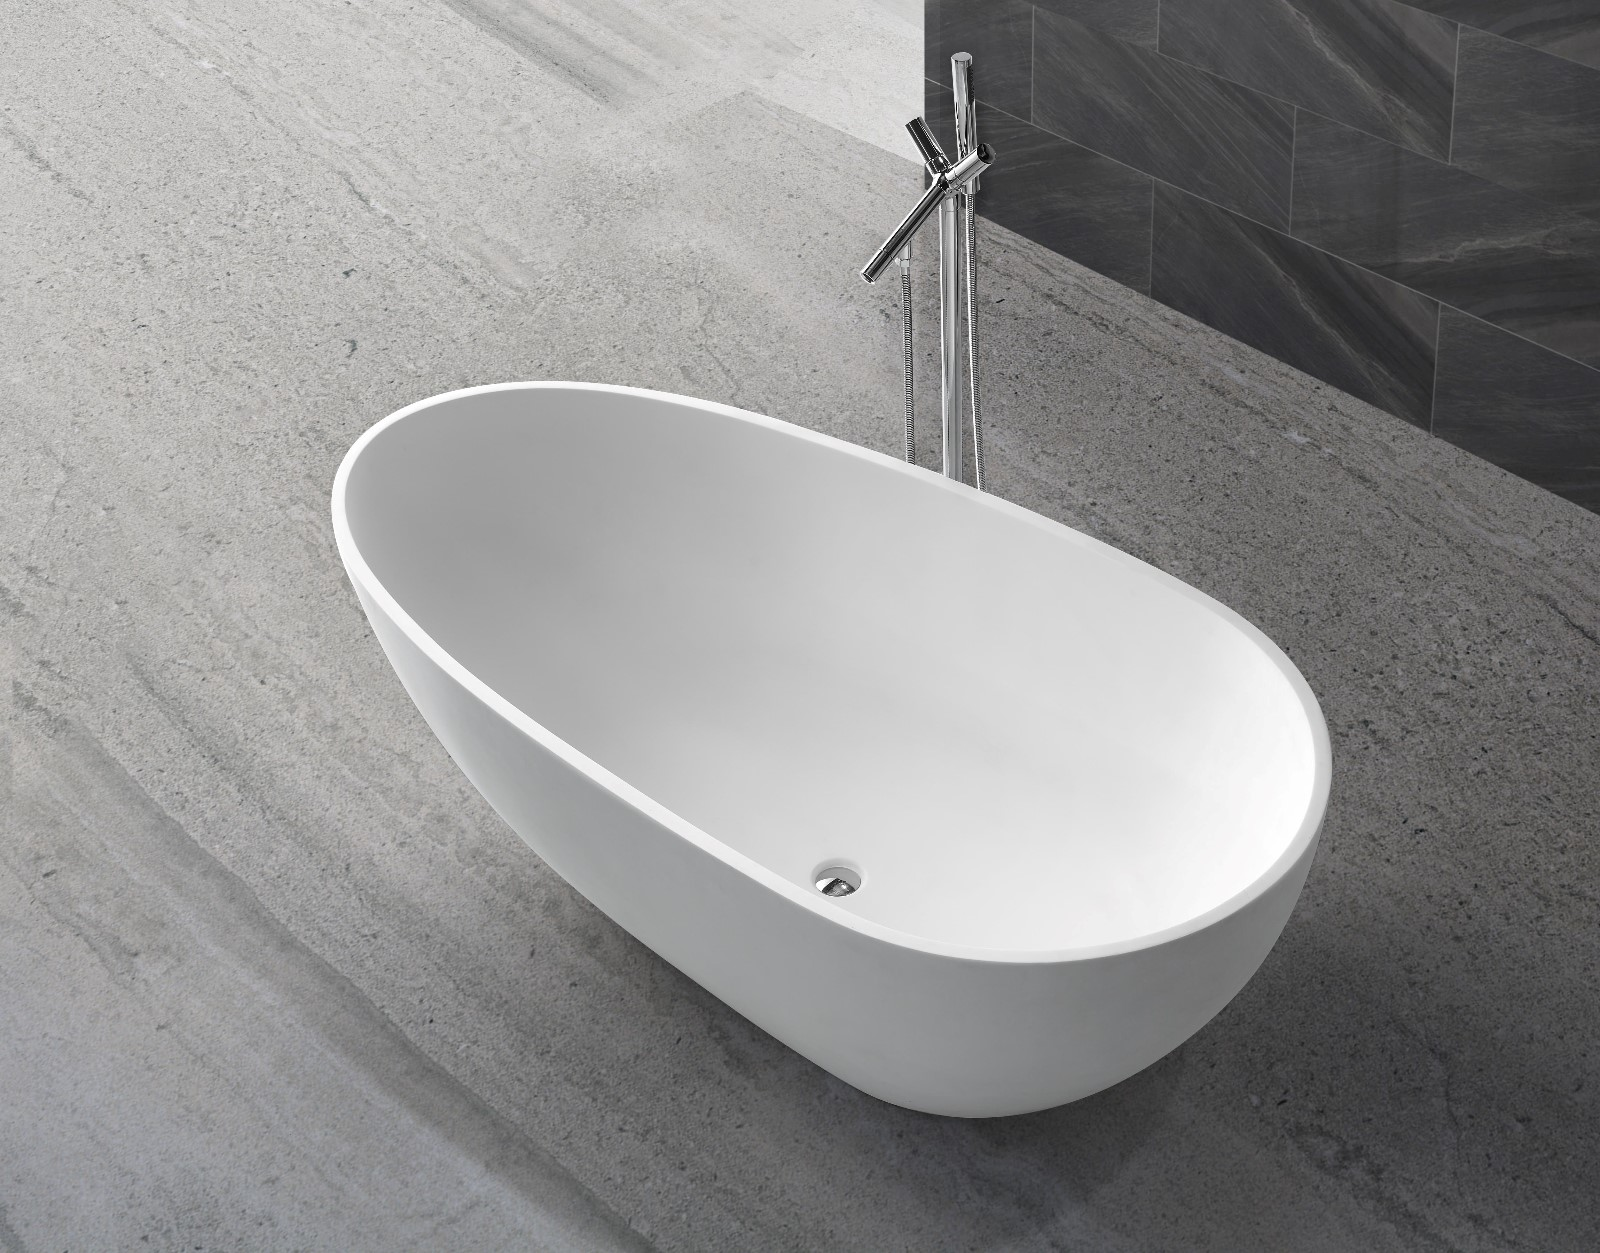 KingKonree acrylic freestanding bathtub ODM for hotel-1